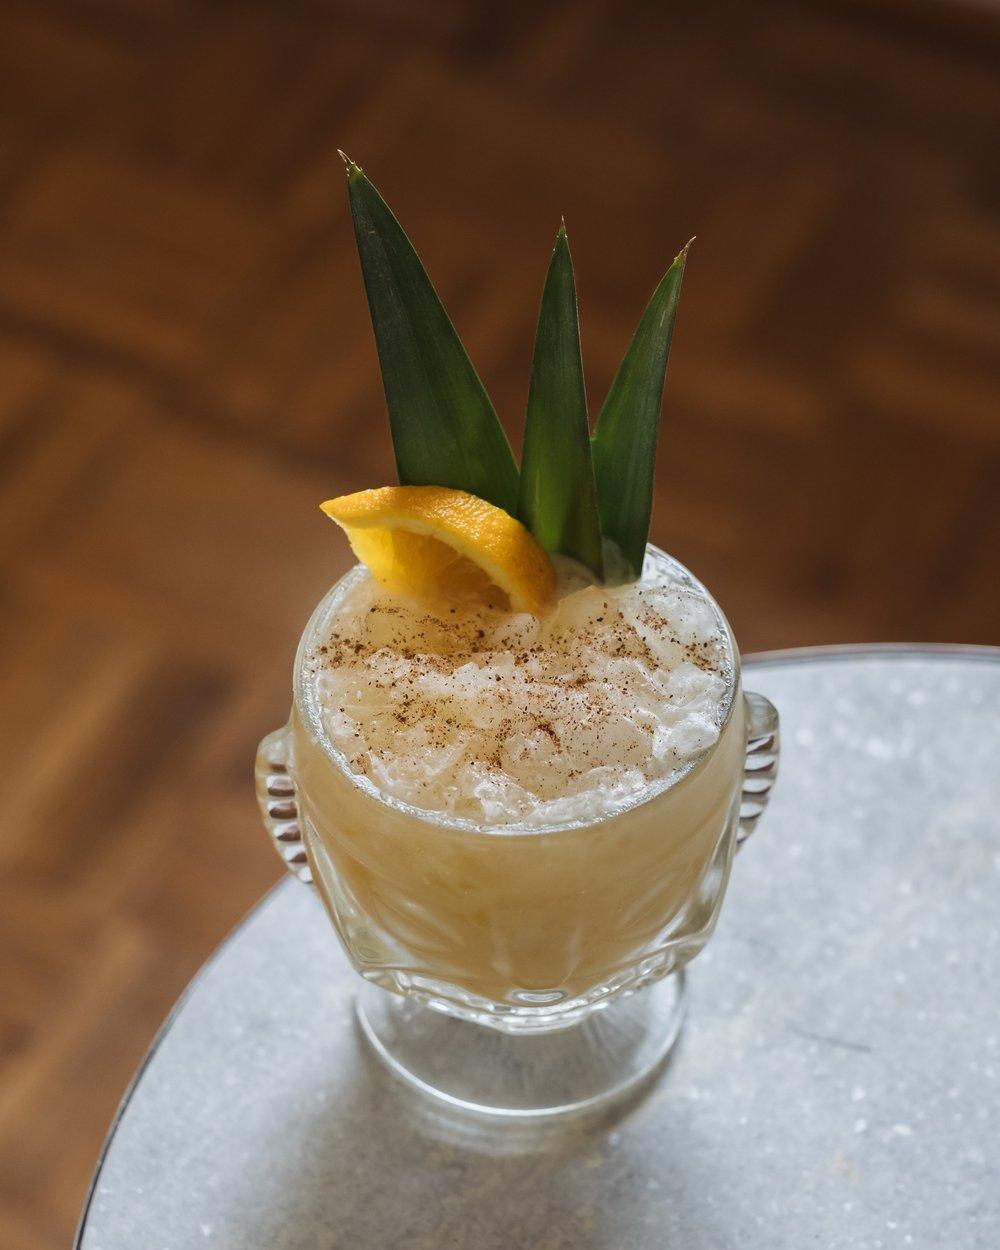 ingredients - 2–4 oz of Pusser's Navy Rum4 oz unsweetened pineapple juice1 oz freshly squeezed orange juice1 oz cream of coconut